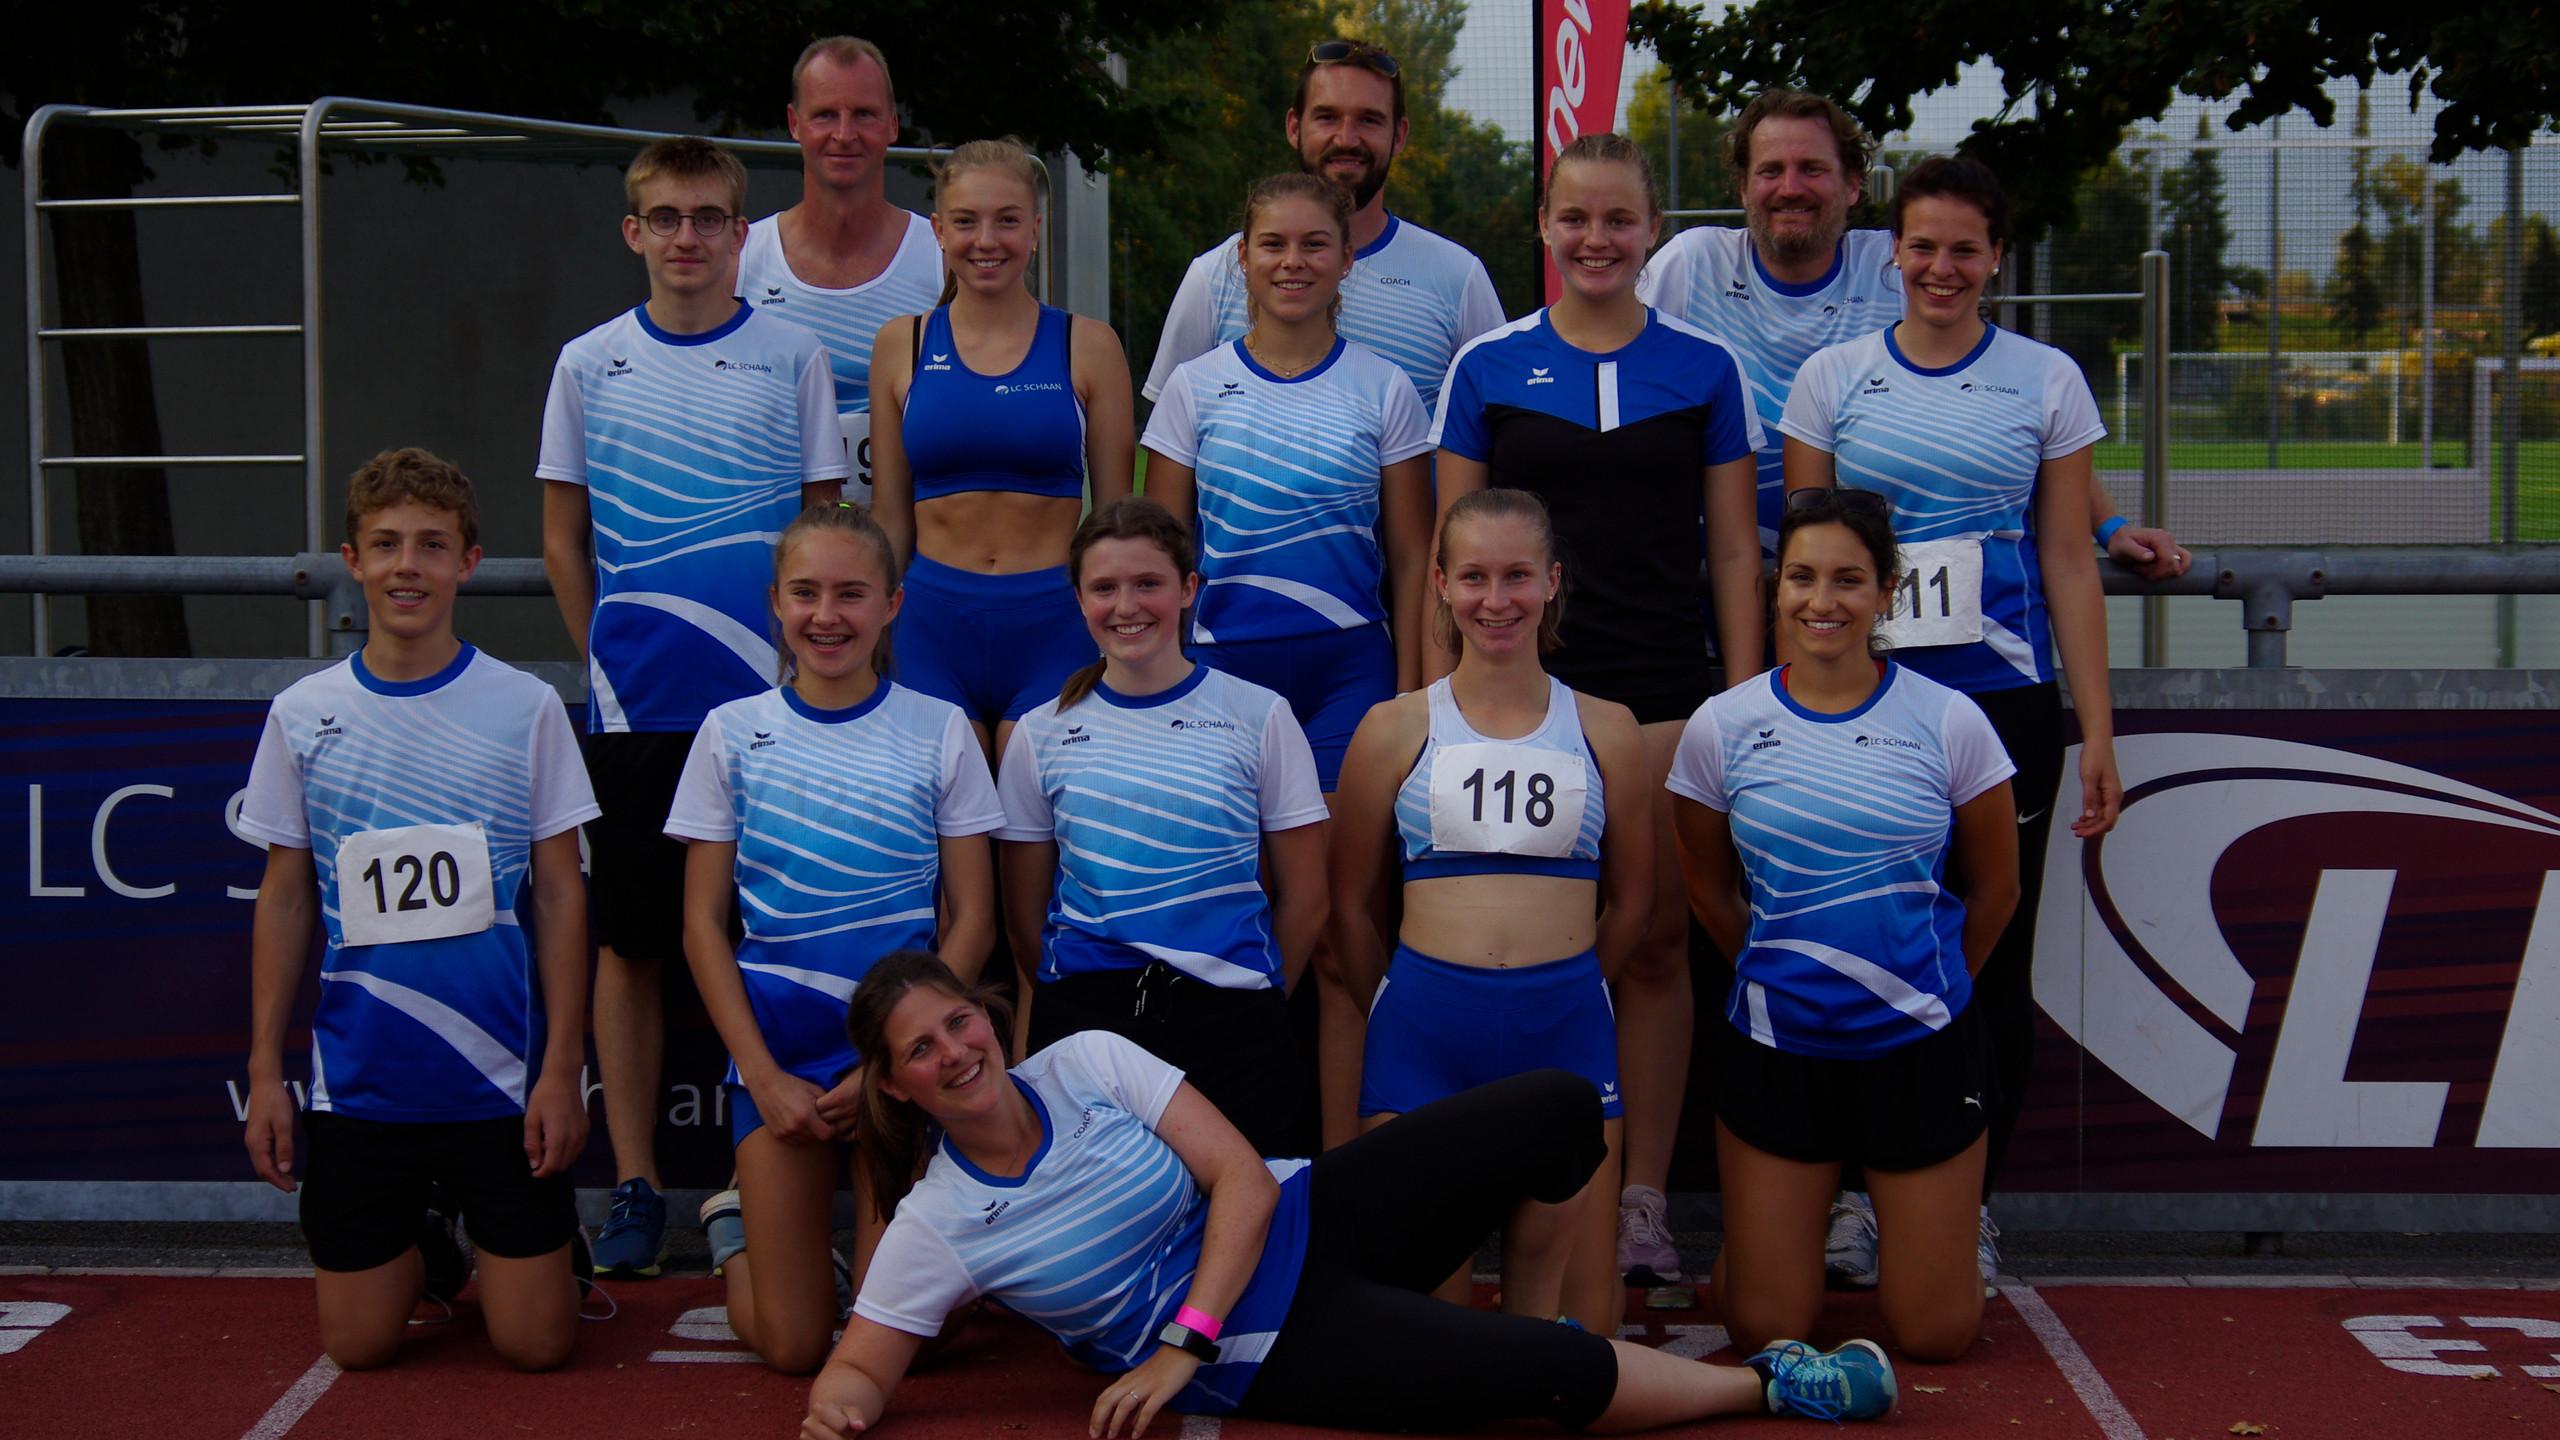 Julia LC Landesmeisterschaft 12.09